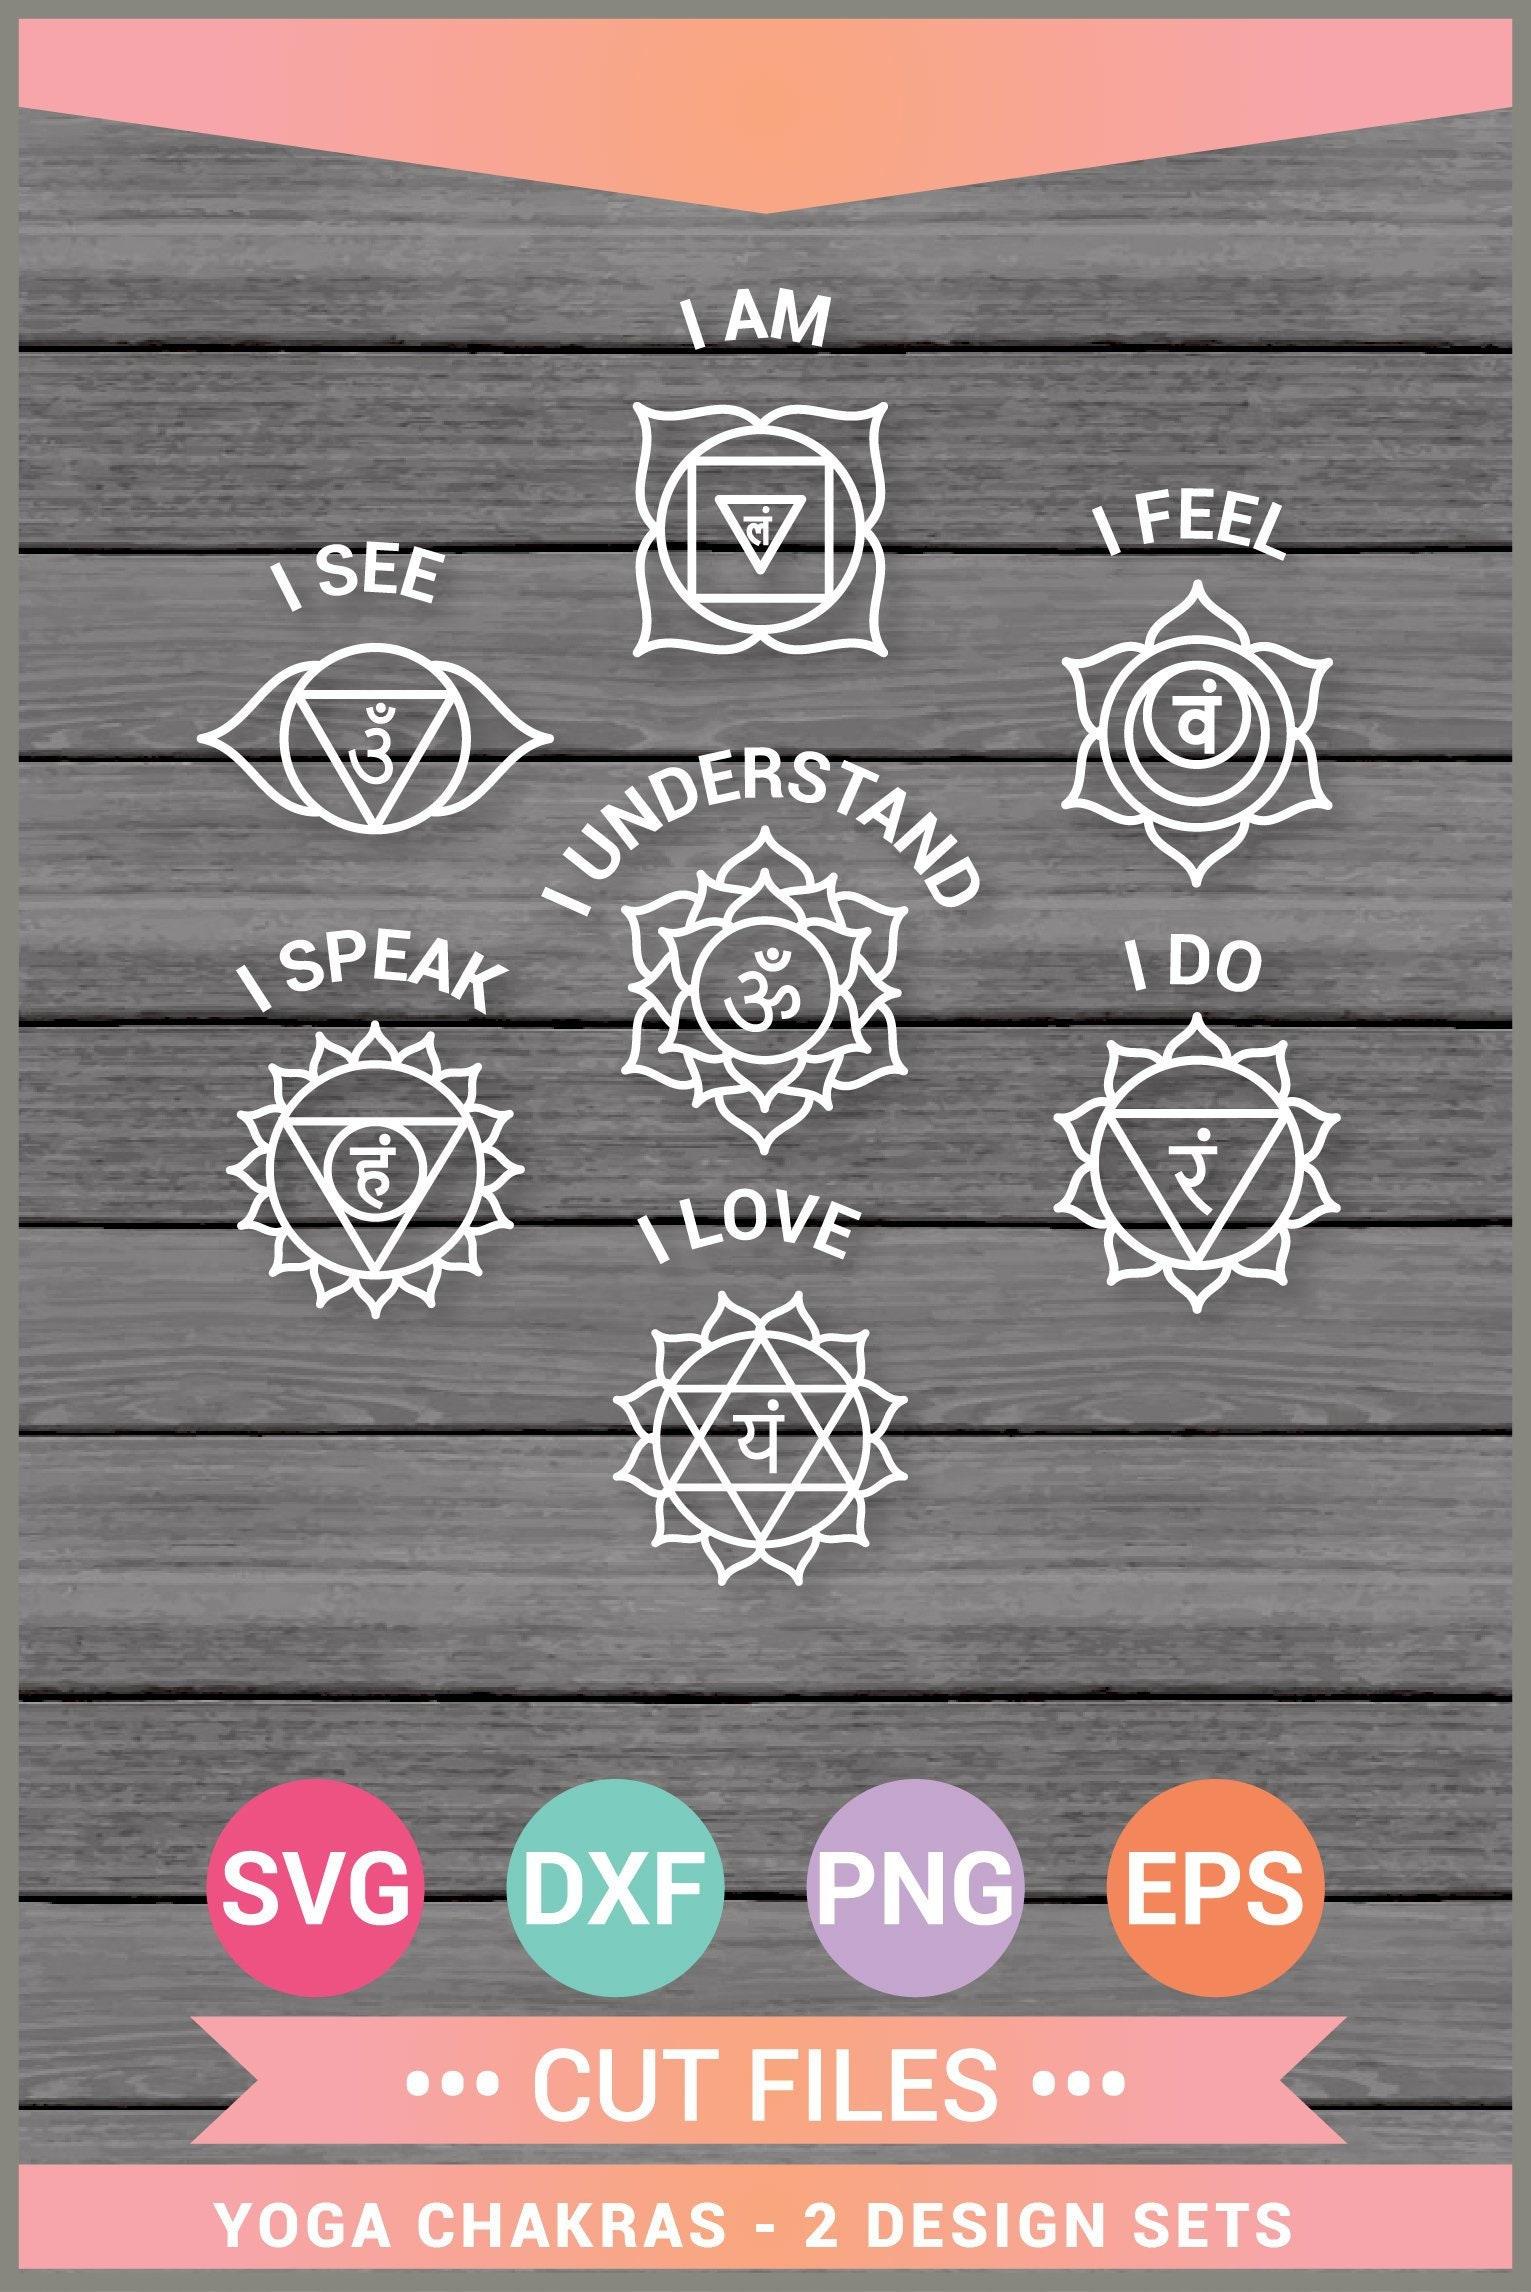 Chakras SVG Bundle 7 Chakras SVG Yoga Kundalini Meditation Spiritual Svg Chakras SVG Clip Art Chakra Chakras Print Cricut Silhouette Cameo